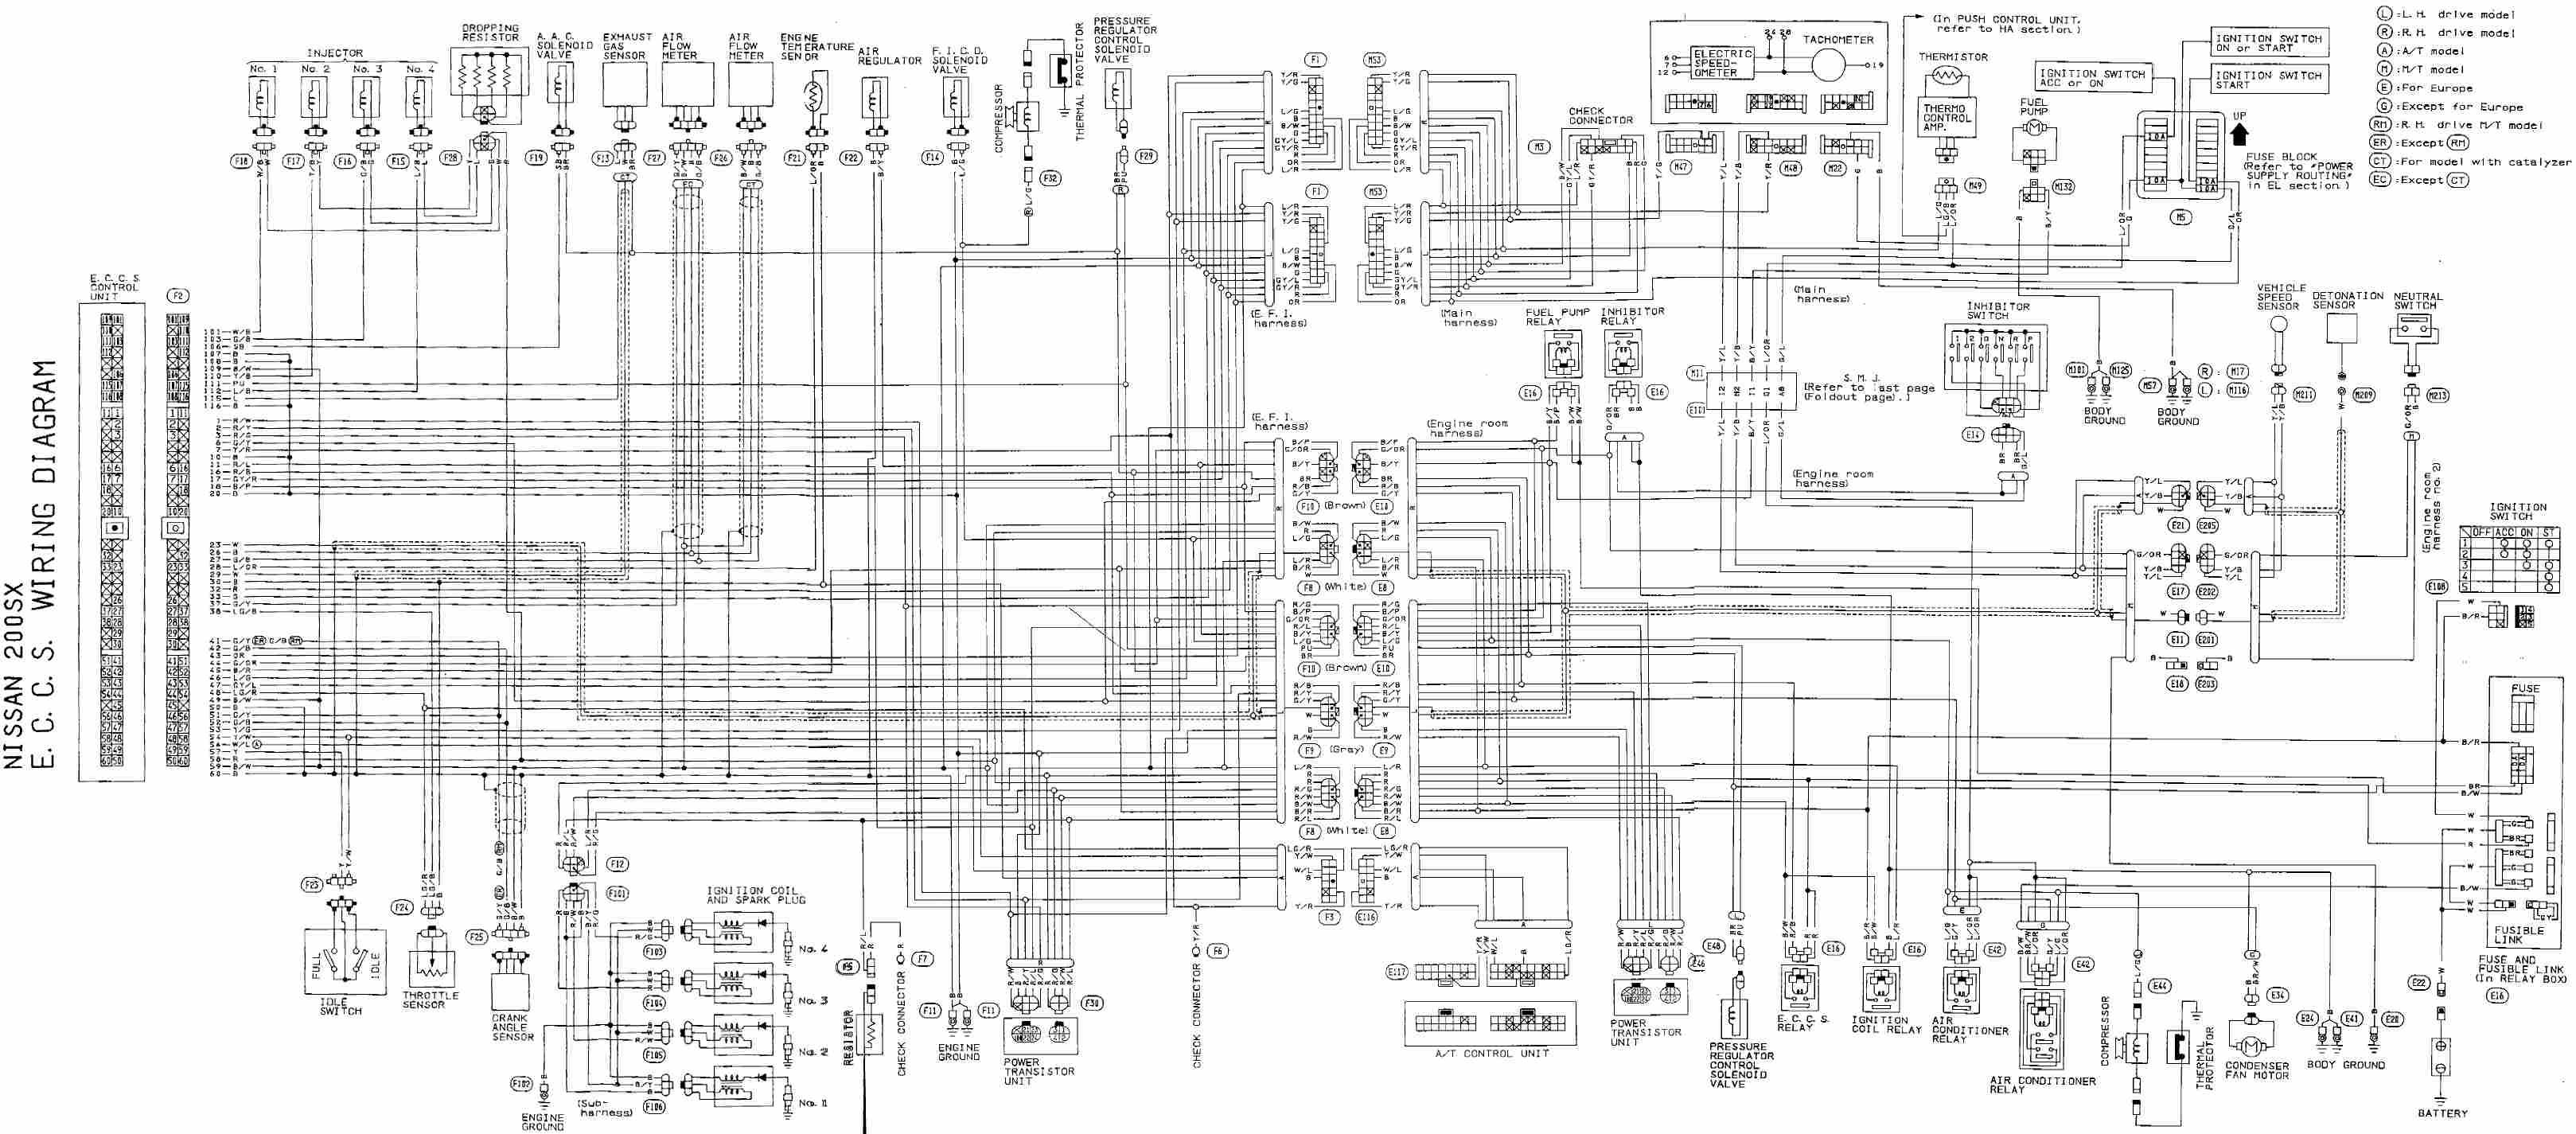 1996 nissan sentra radio wiring harness diagram wiring Nissan Bose Radio Wiring Diagram